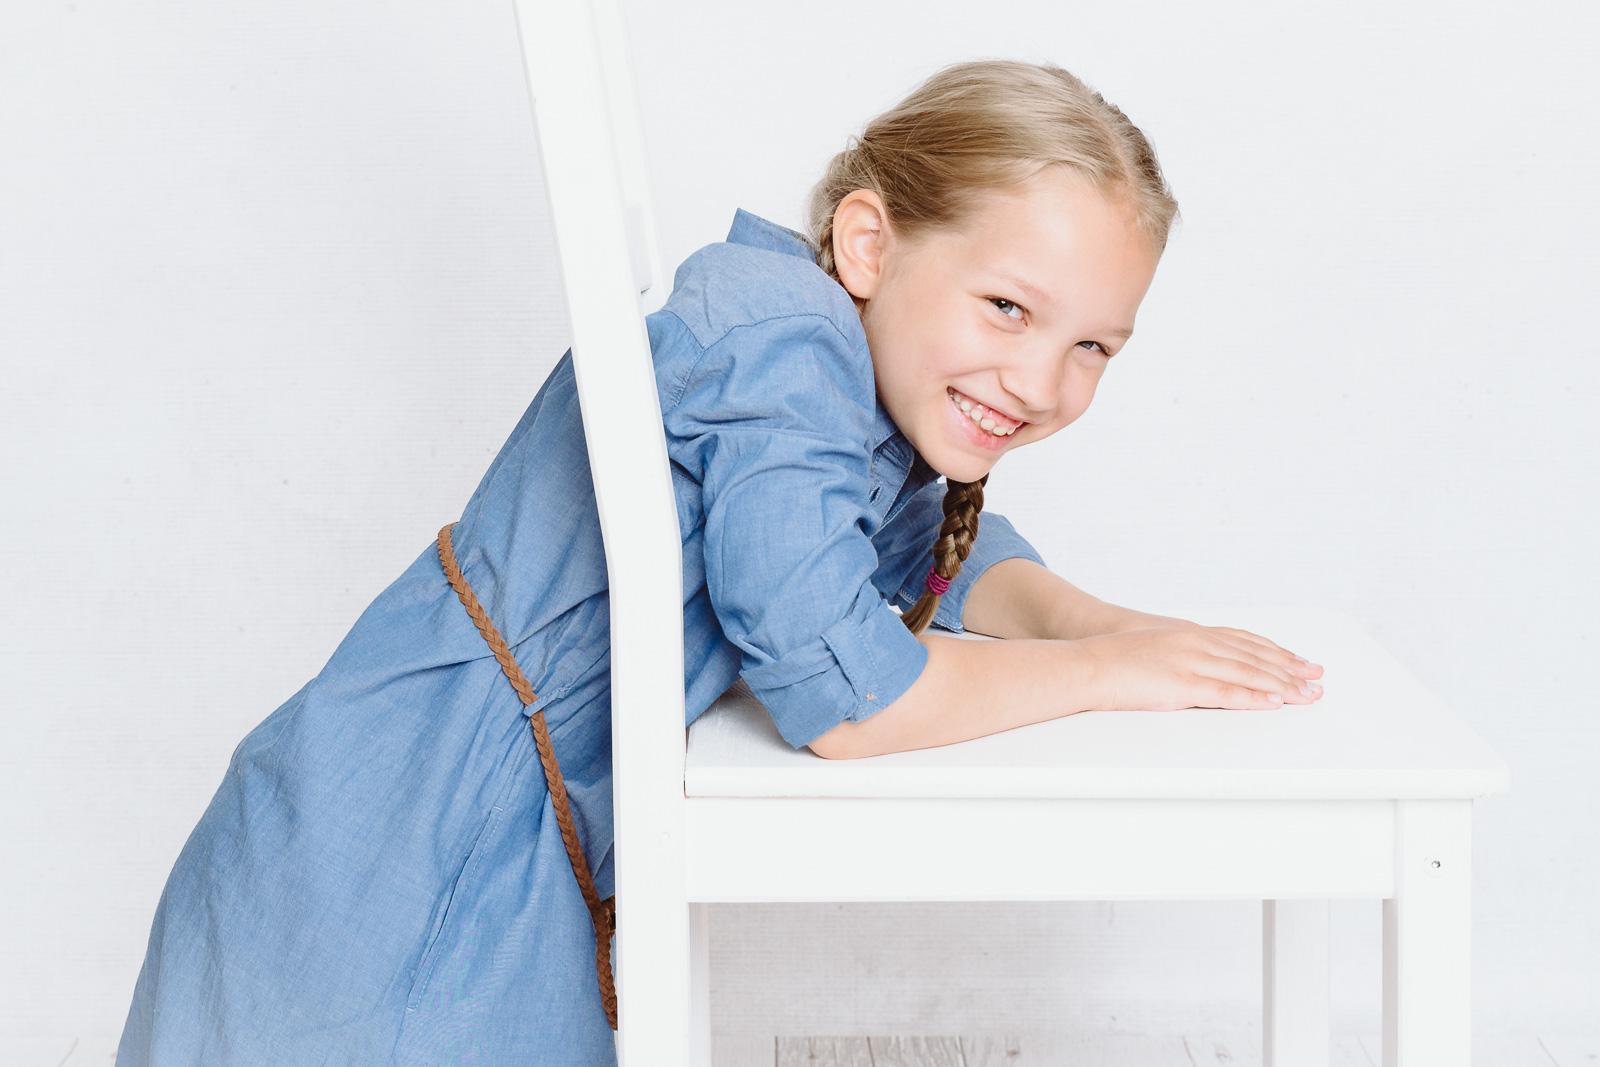 Kind lacht-Kindergartenfotografin aus Bonn